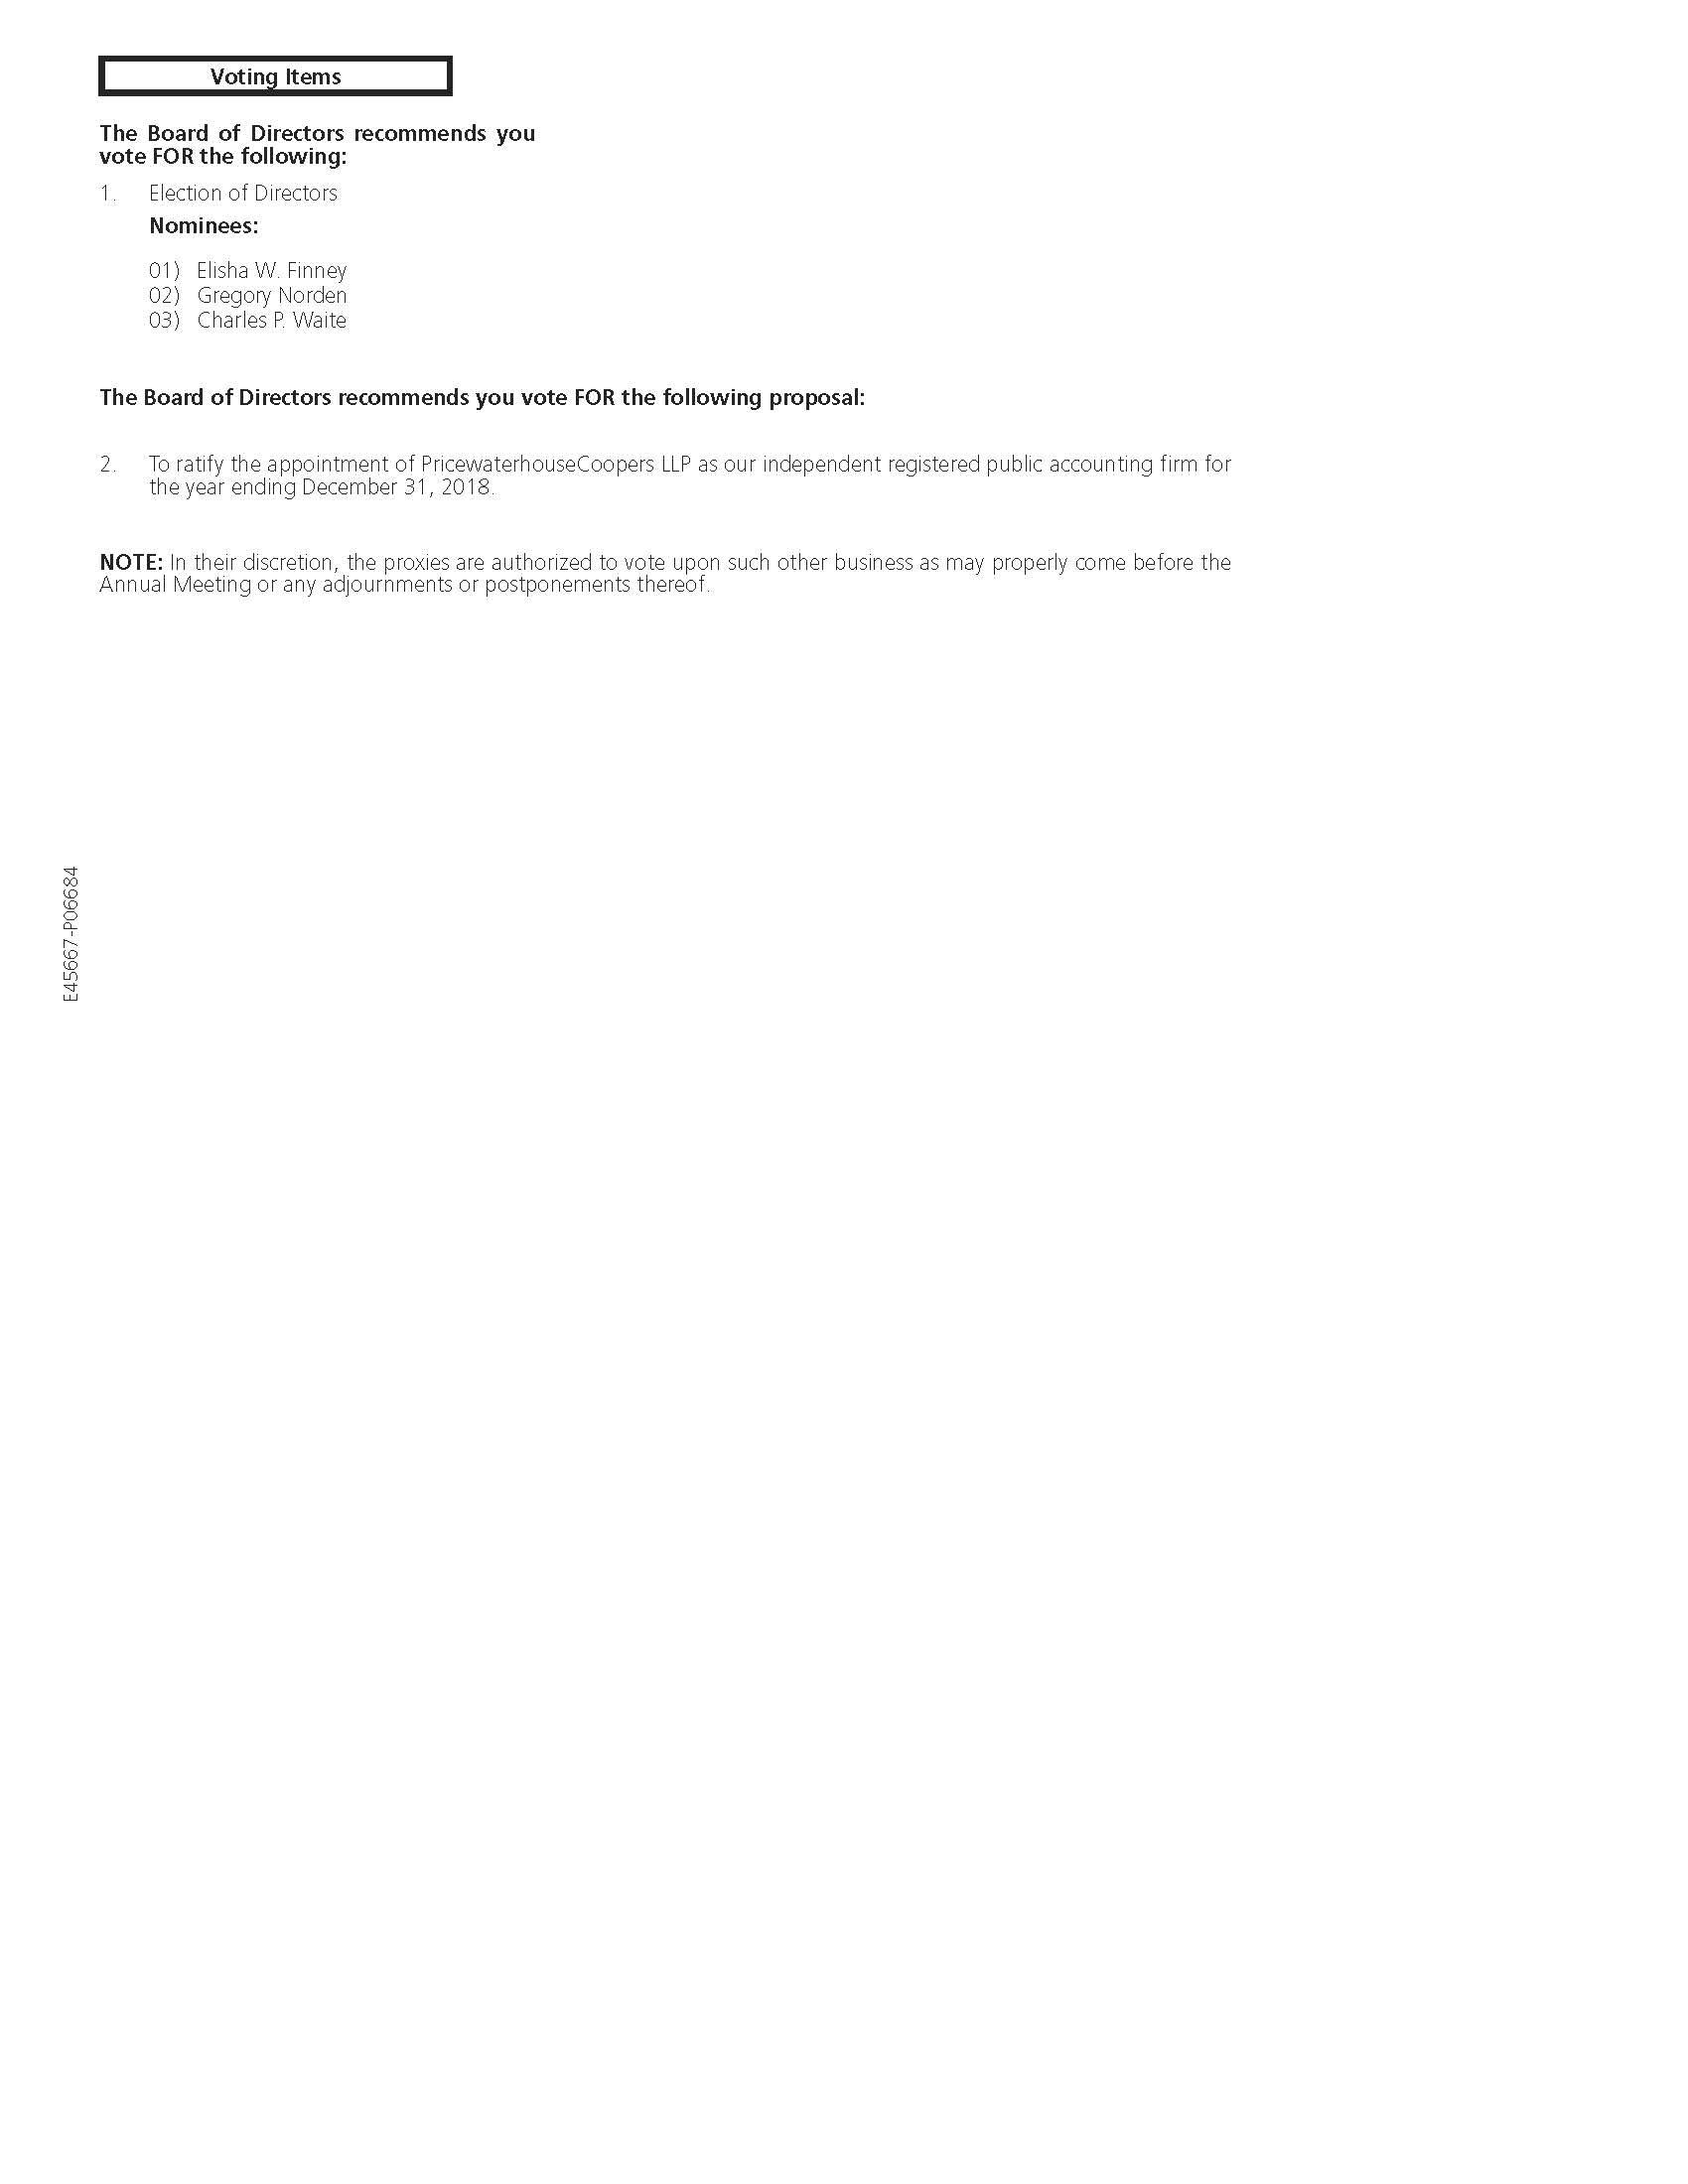 https://cdn.kscope.io/04aec73bc6c3fb1aee1874ebbb35fdc9-proxynotice3.jpg